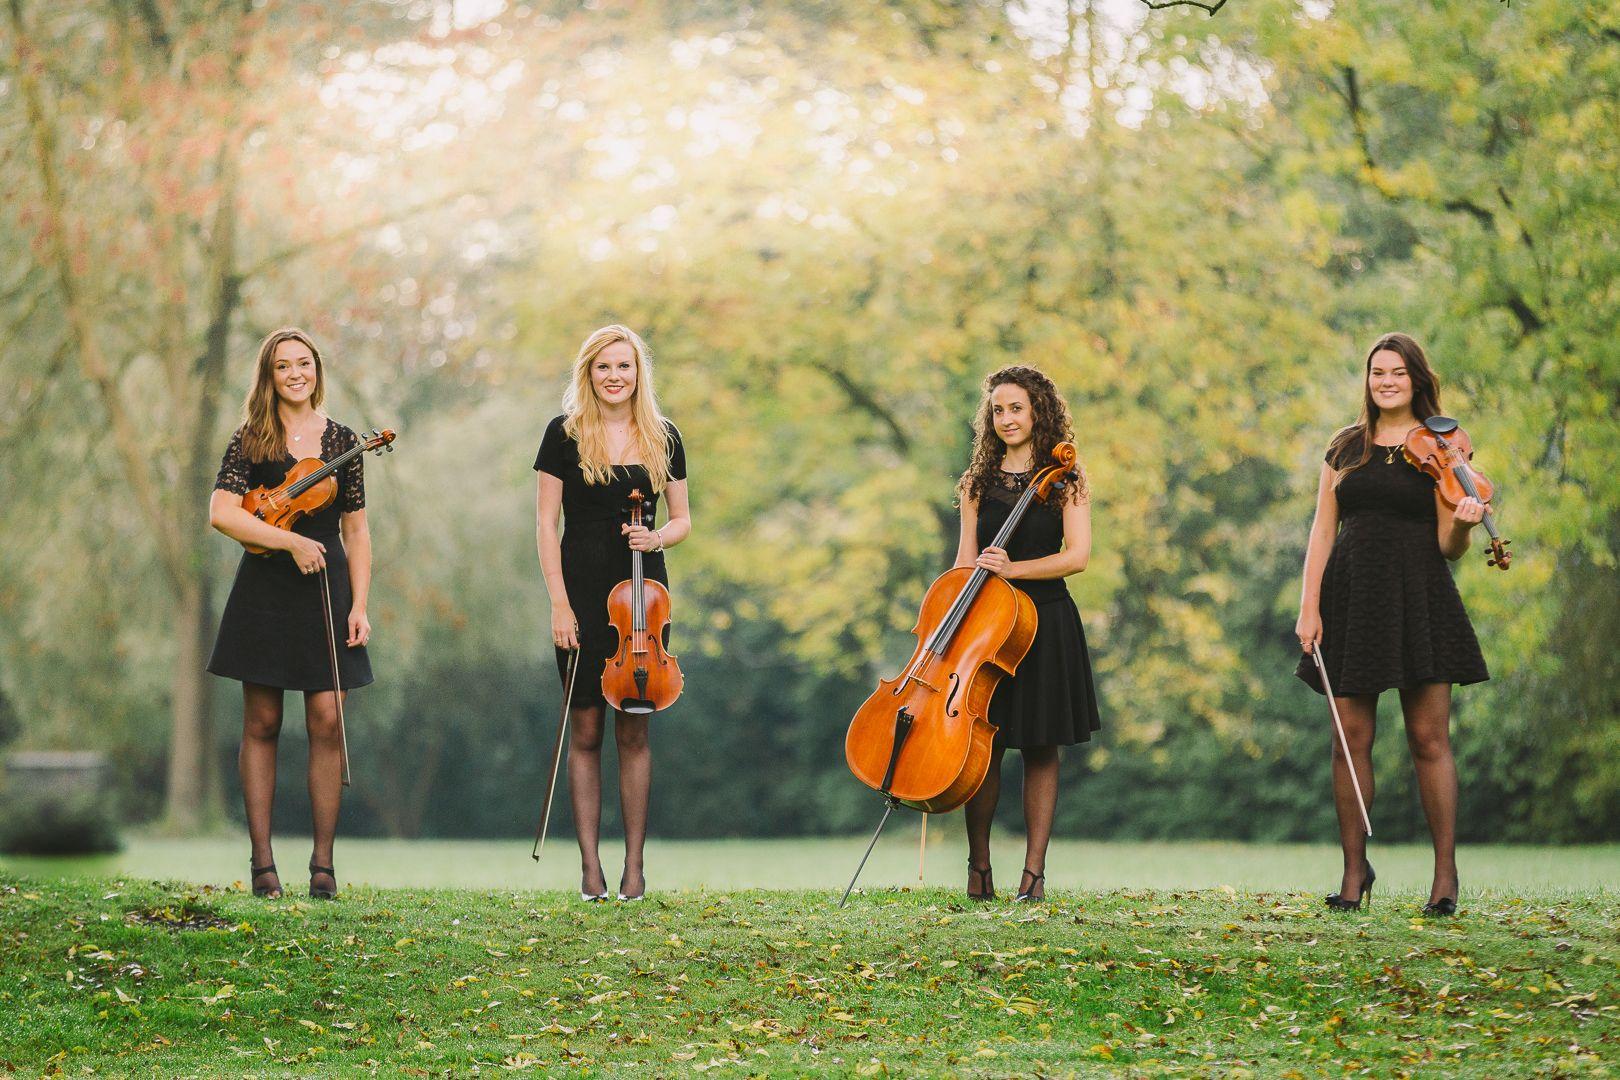 Pin on String Quartets, Trios & Duos